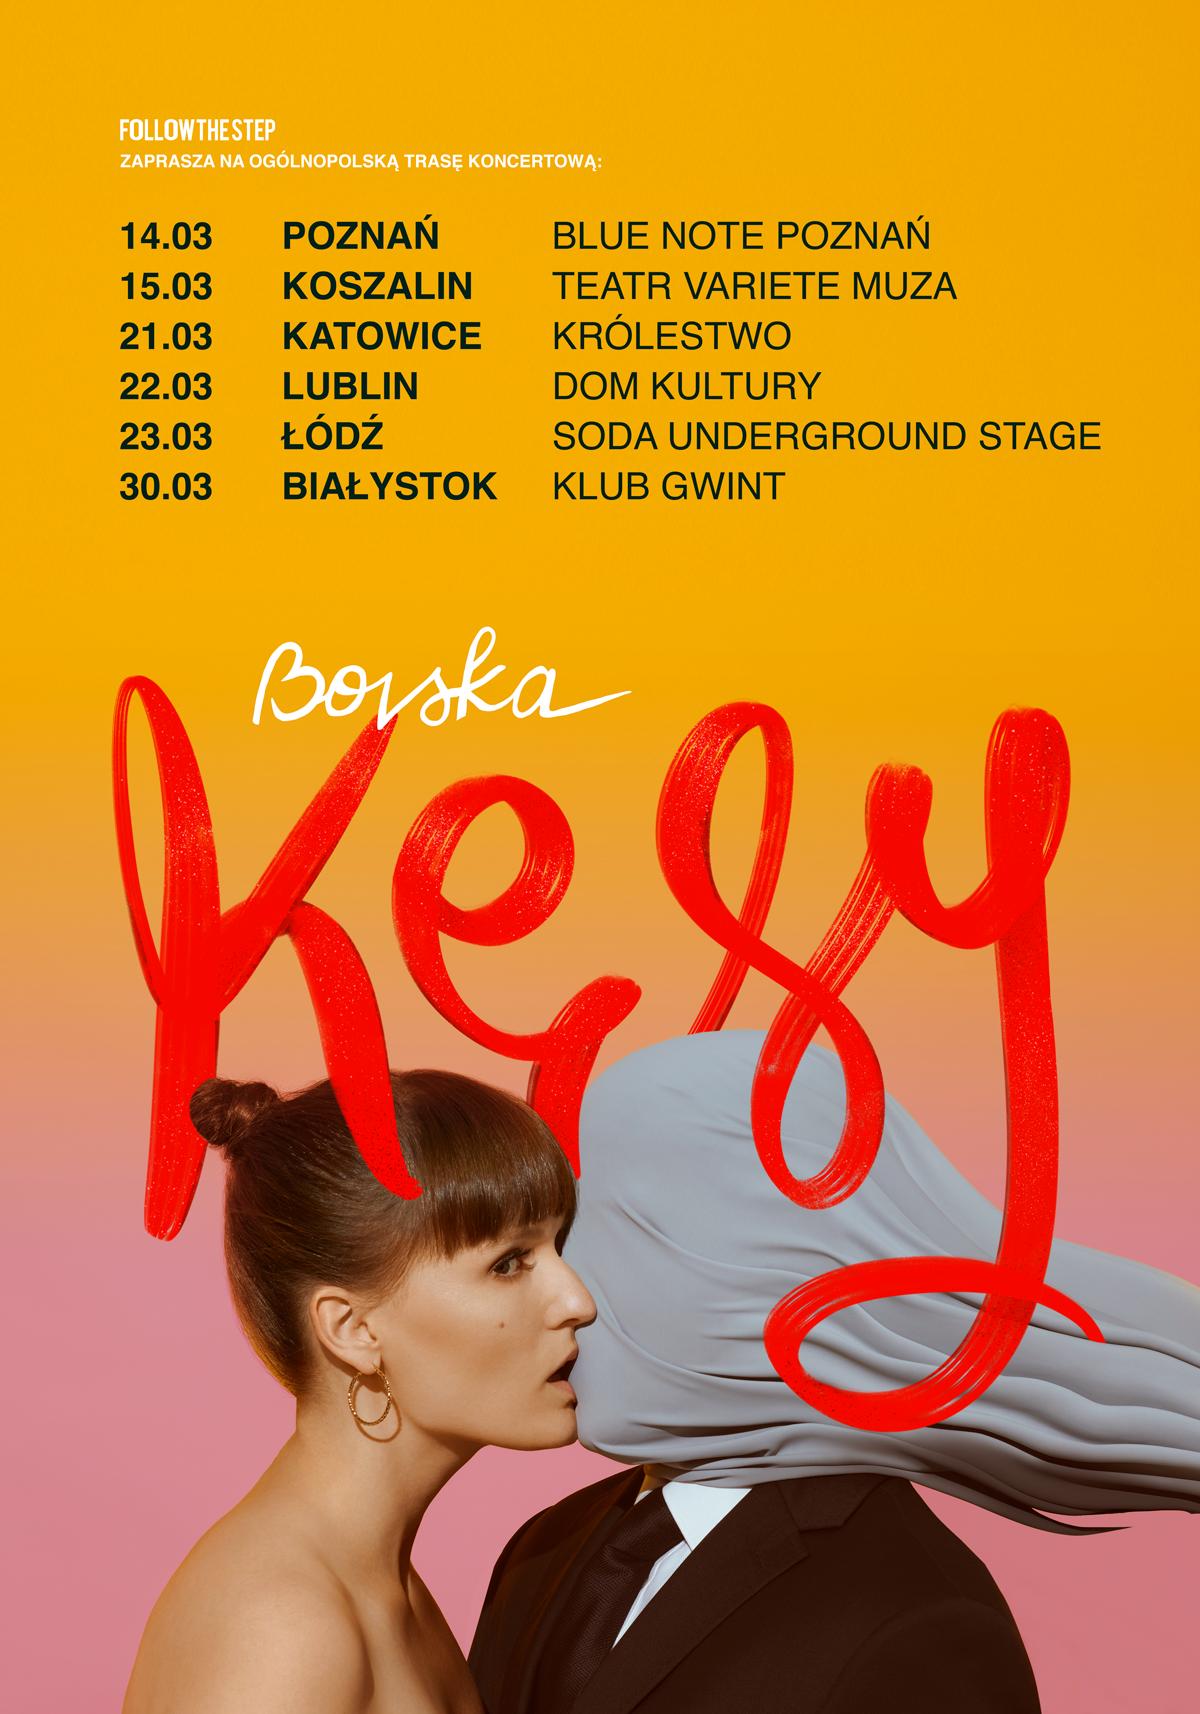 Plakat promujący trasę Bovskej